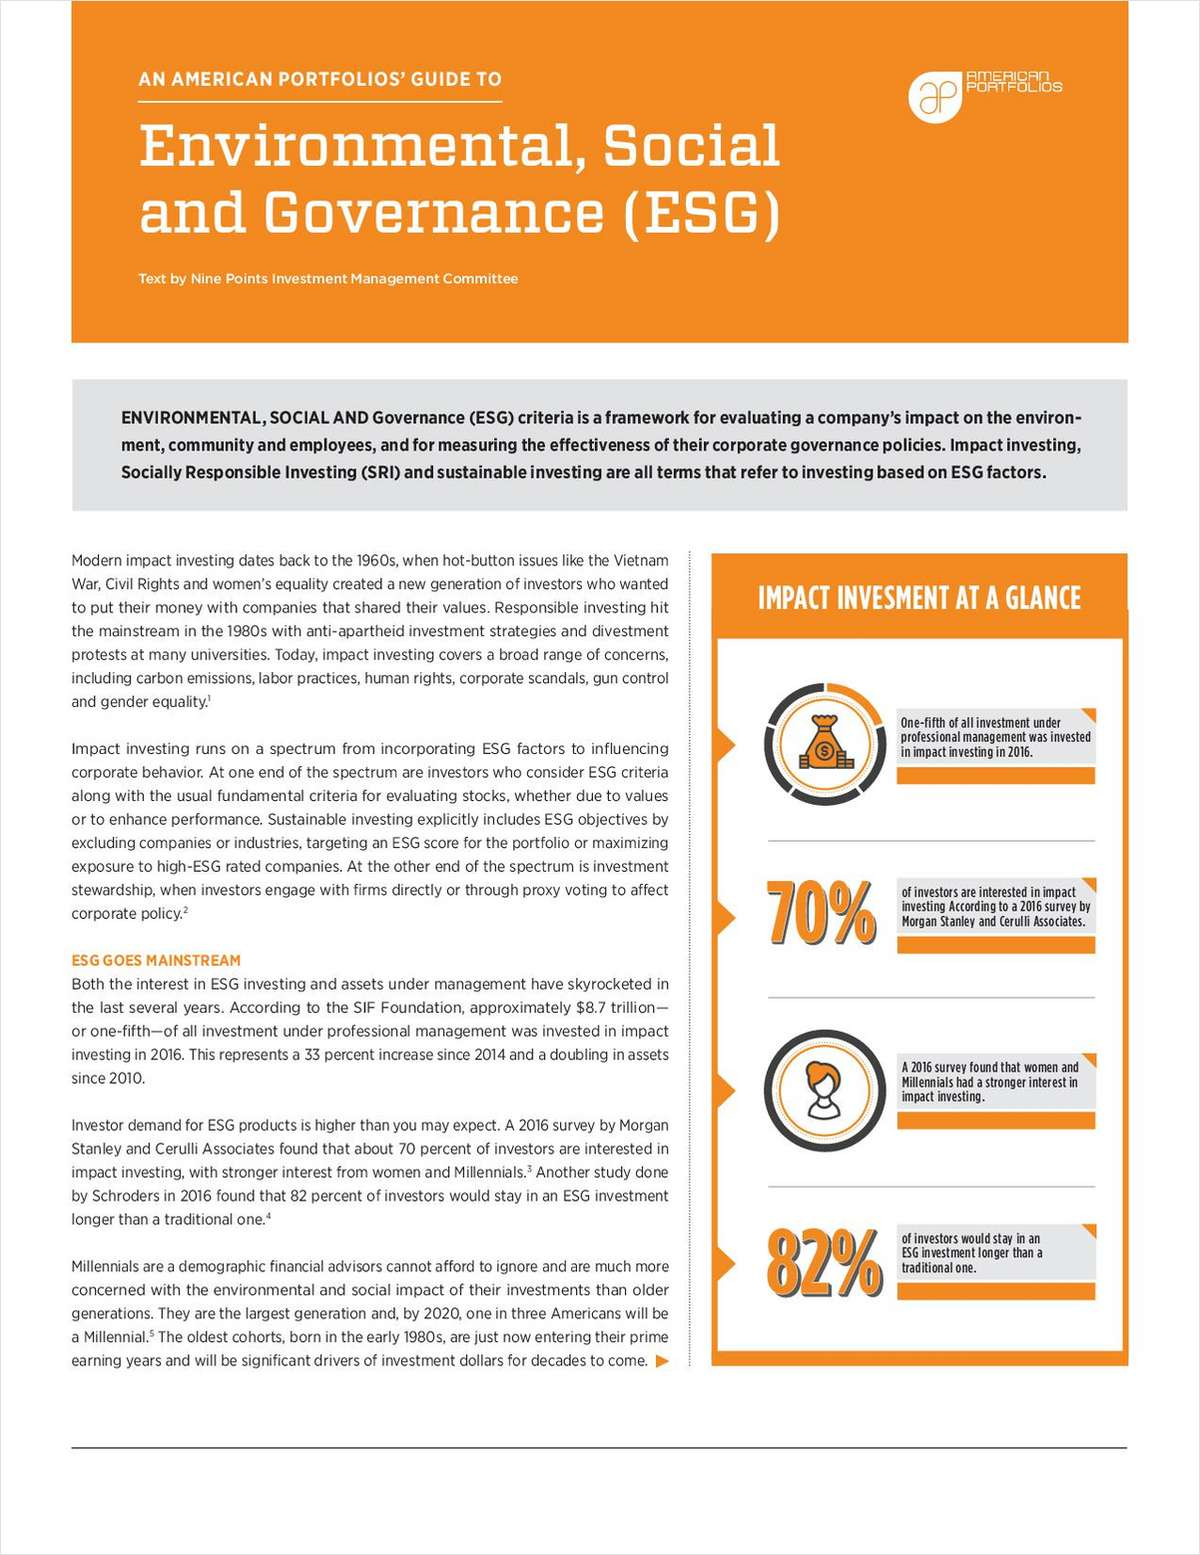 A Guide to Environmental, Social and Governance (ESG) Investing